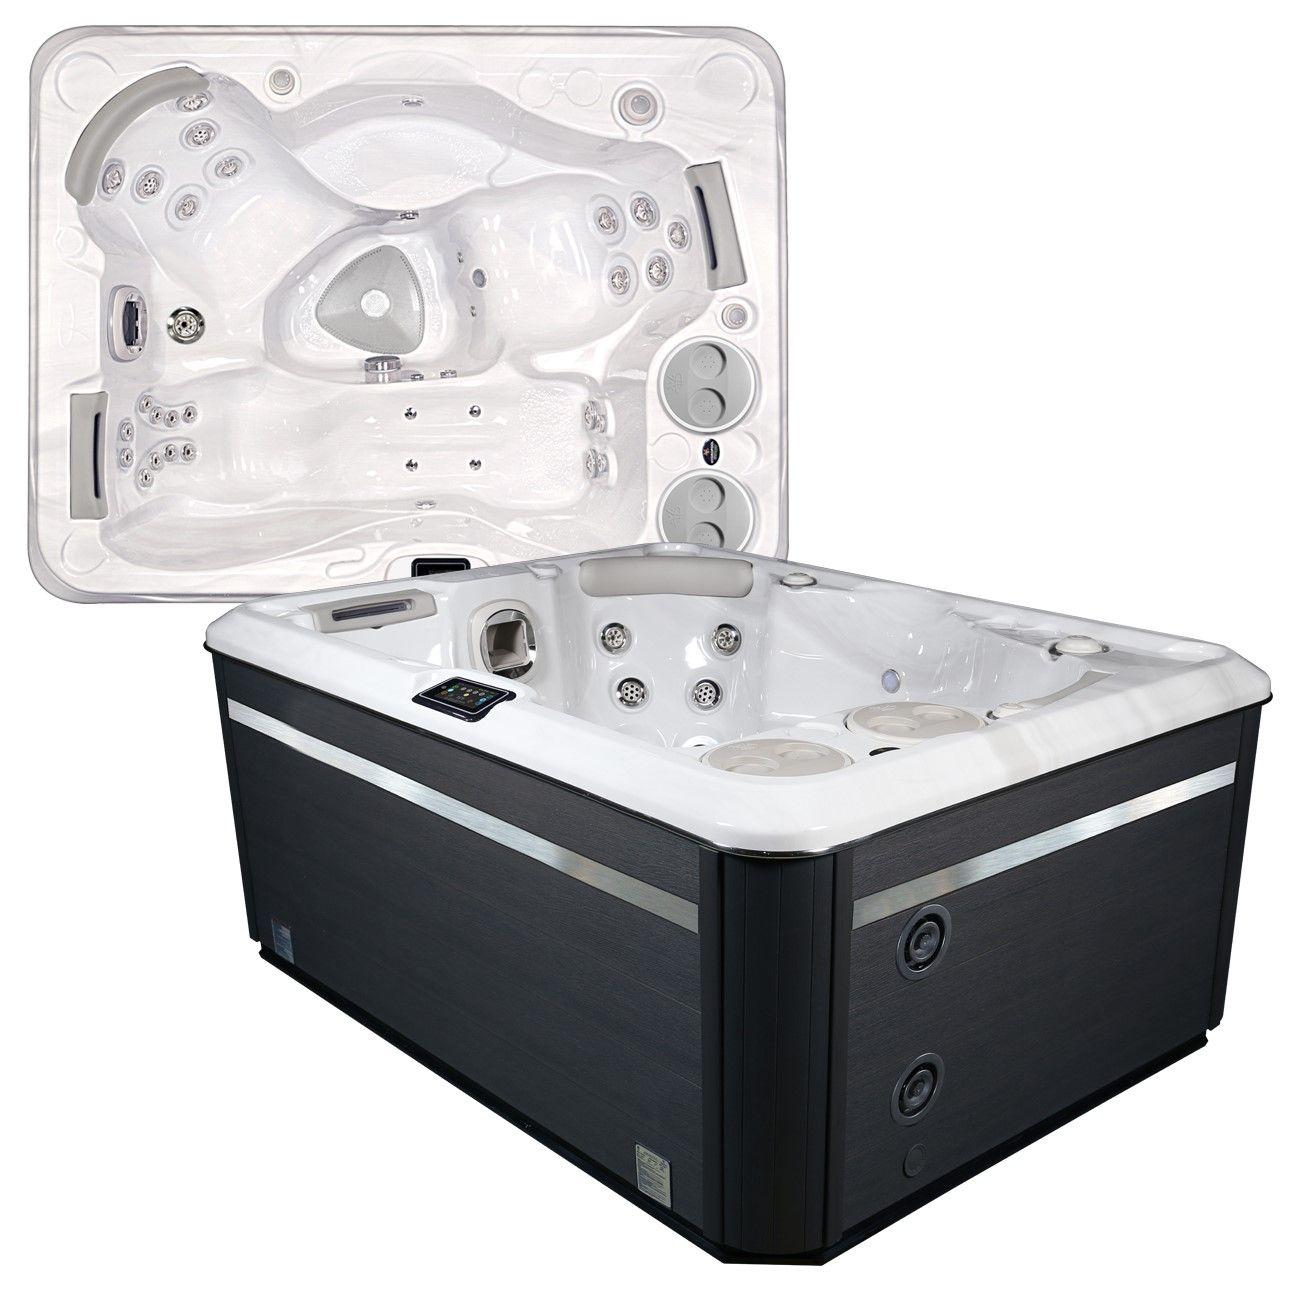 Мини СПА-бассейн с 30 форсунками Hydropool Self Cleaning 395 Gold 216х165 ФОТО